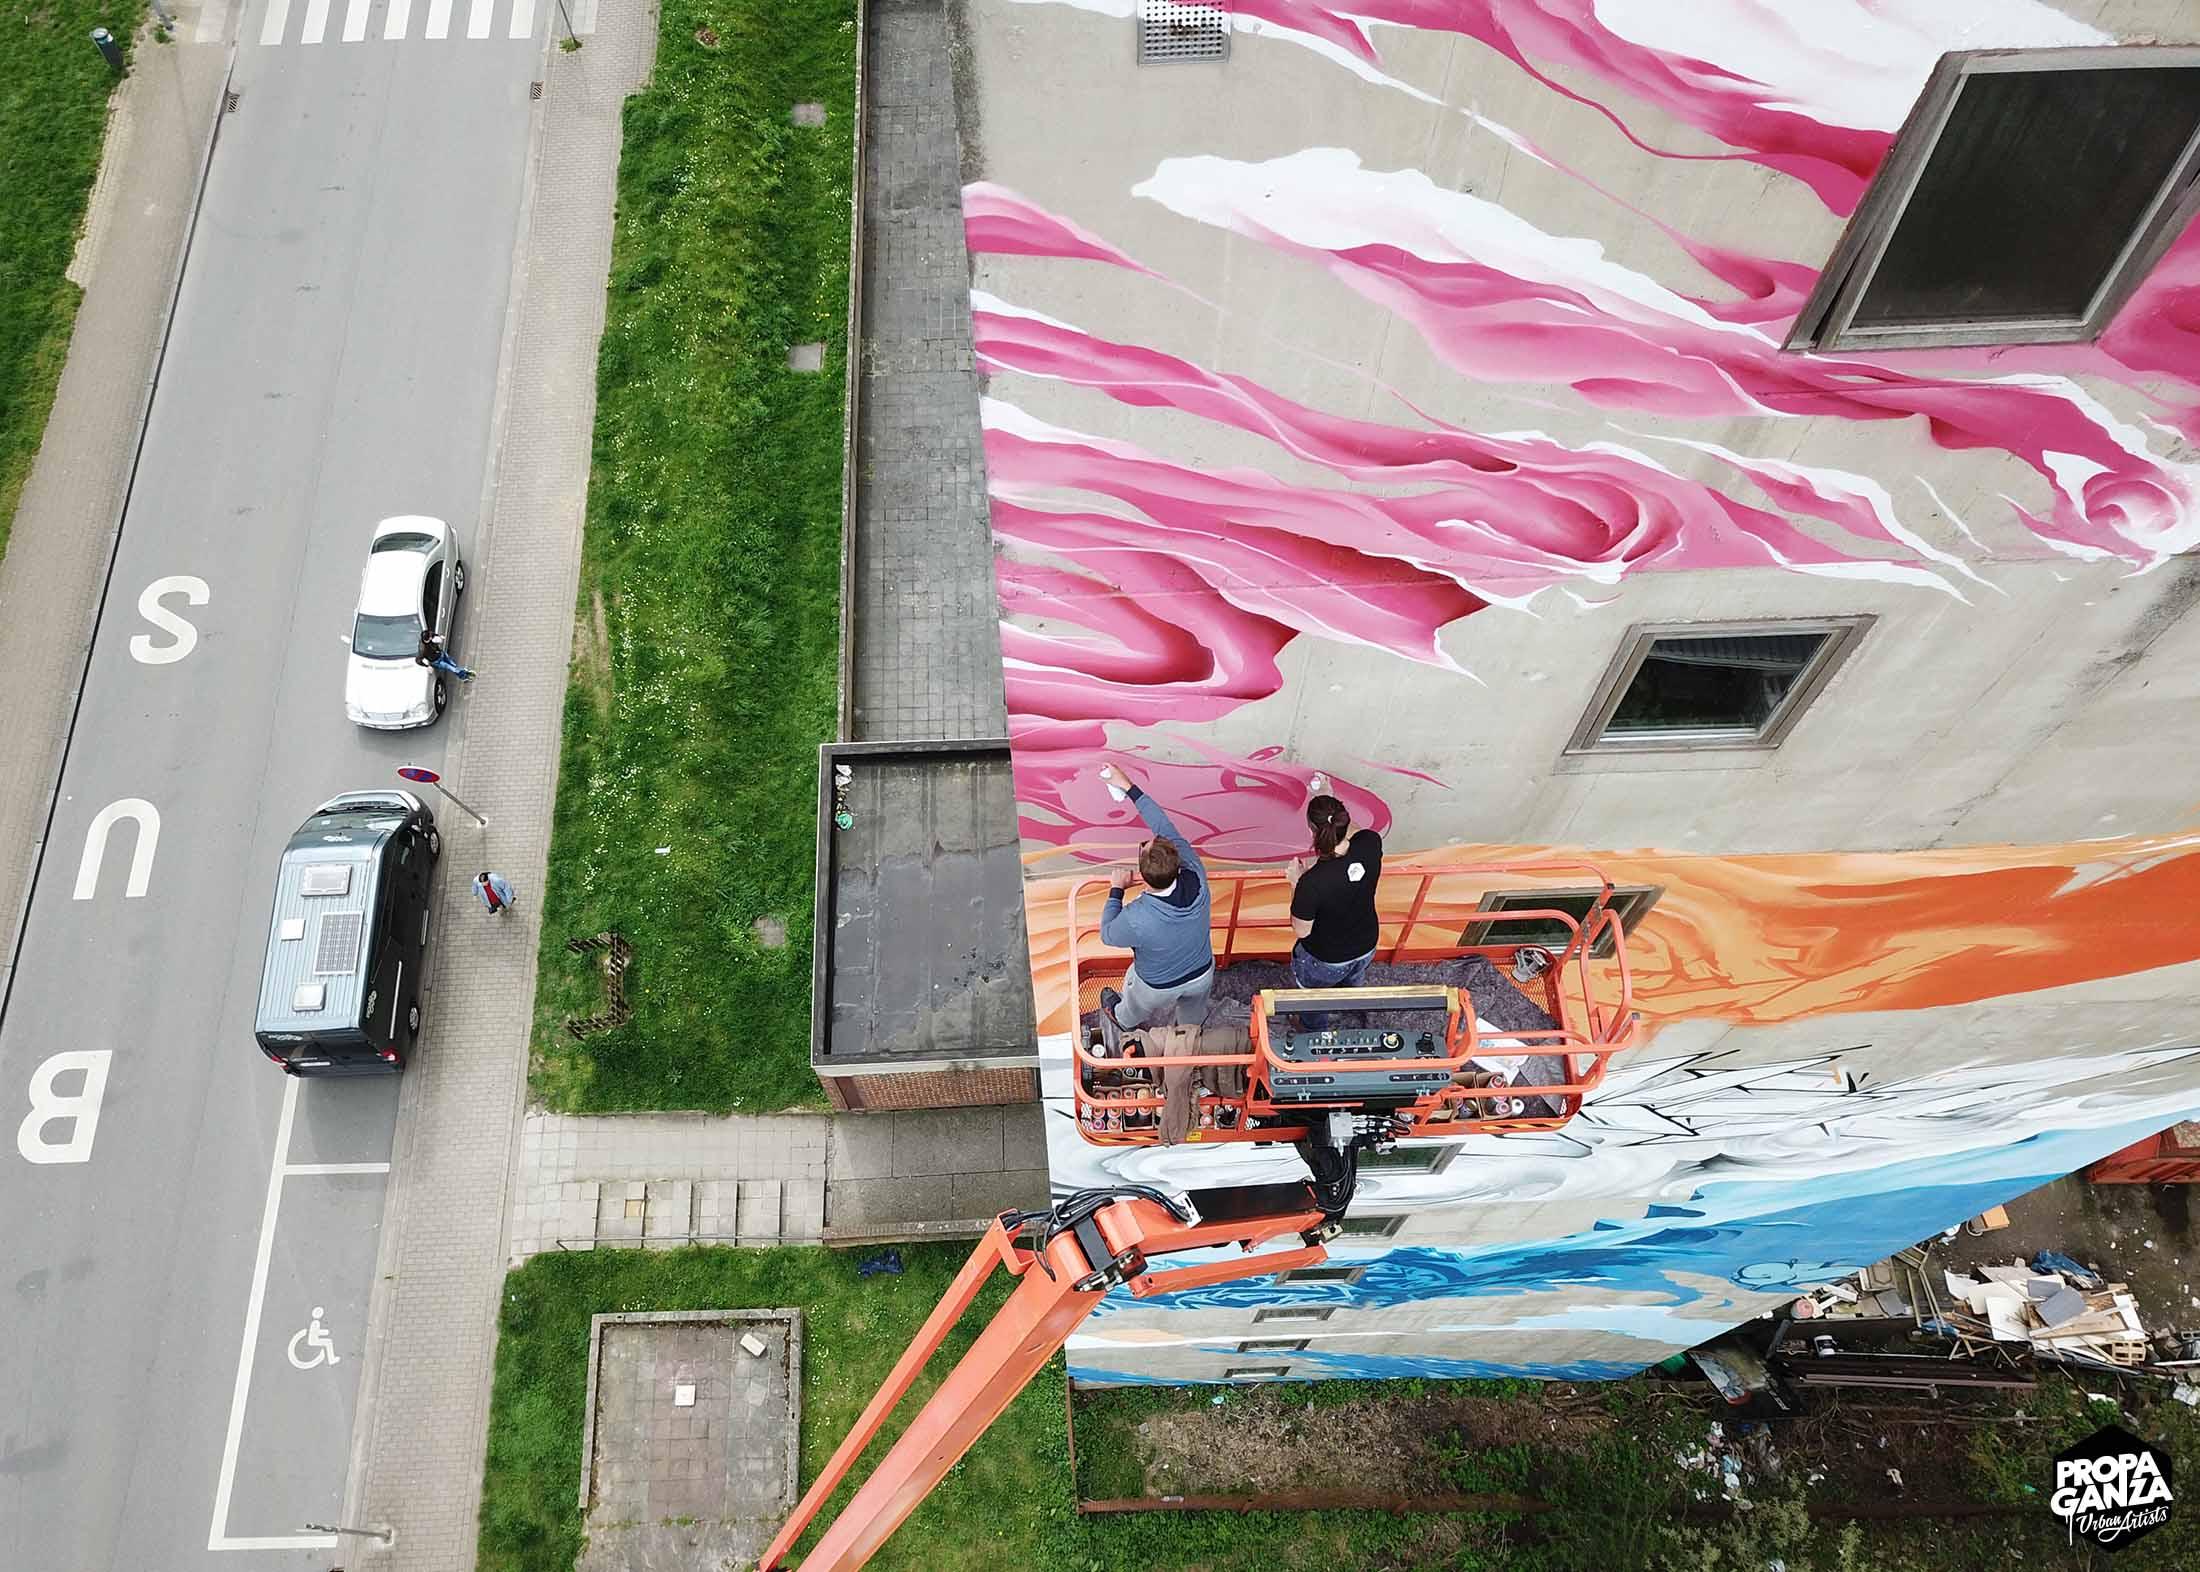 https://www.propaganza.be/wp-content/uploads/2016/05/propaganza-begium-brussels-namur-artist-graffiti-street-art-spray-painting-roubens-trevor-2018.jpg